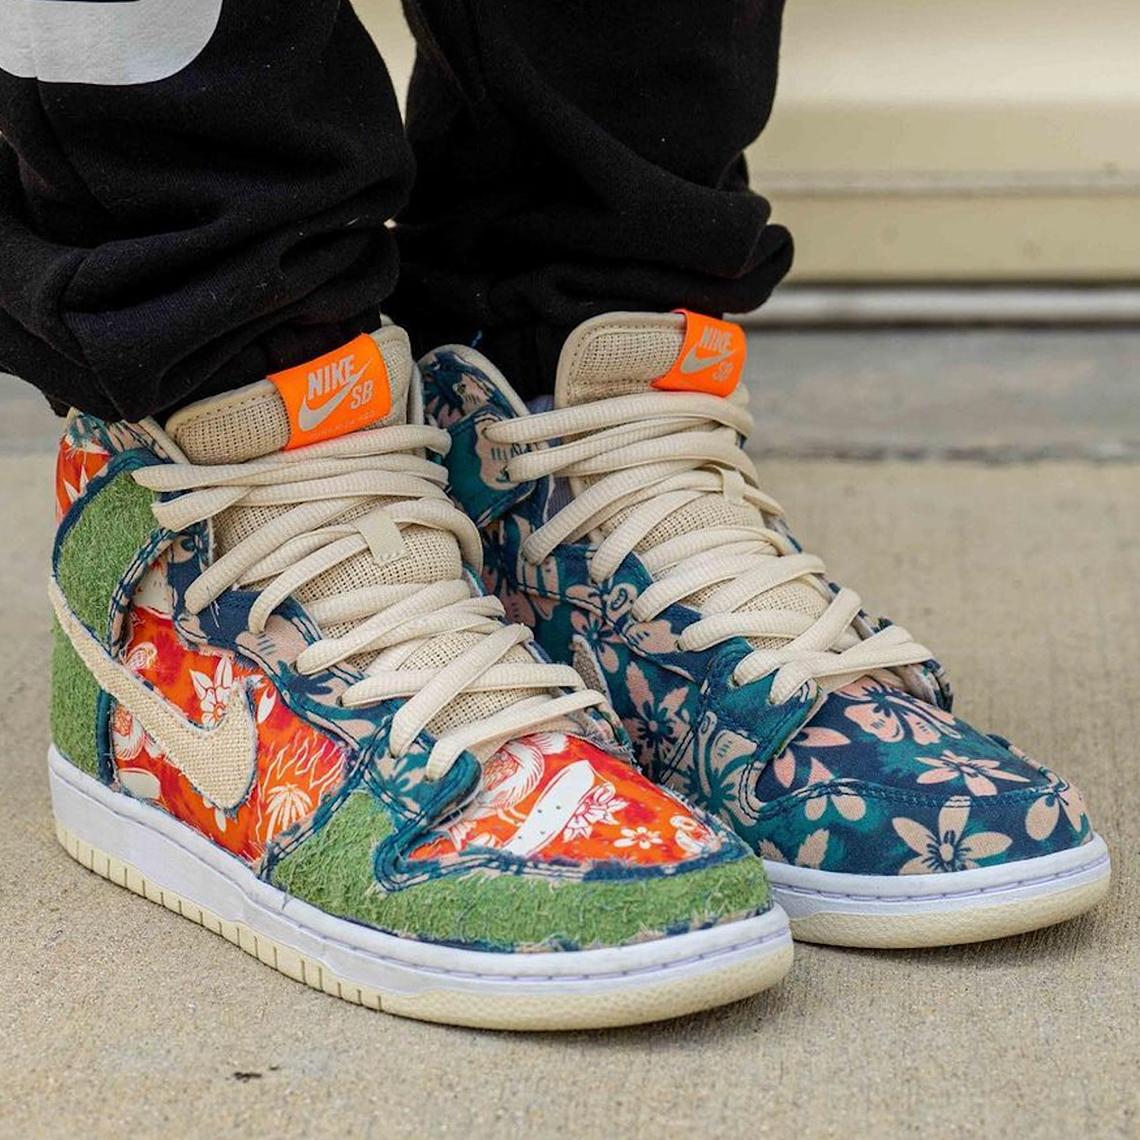 Nike SB Dunk High Maui Wowie CZ2232-300 Release Date   SneakerNews.com